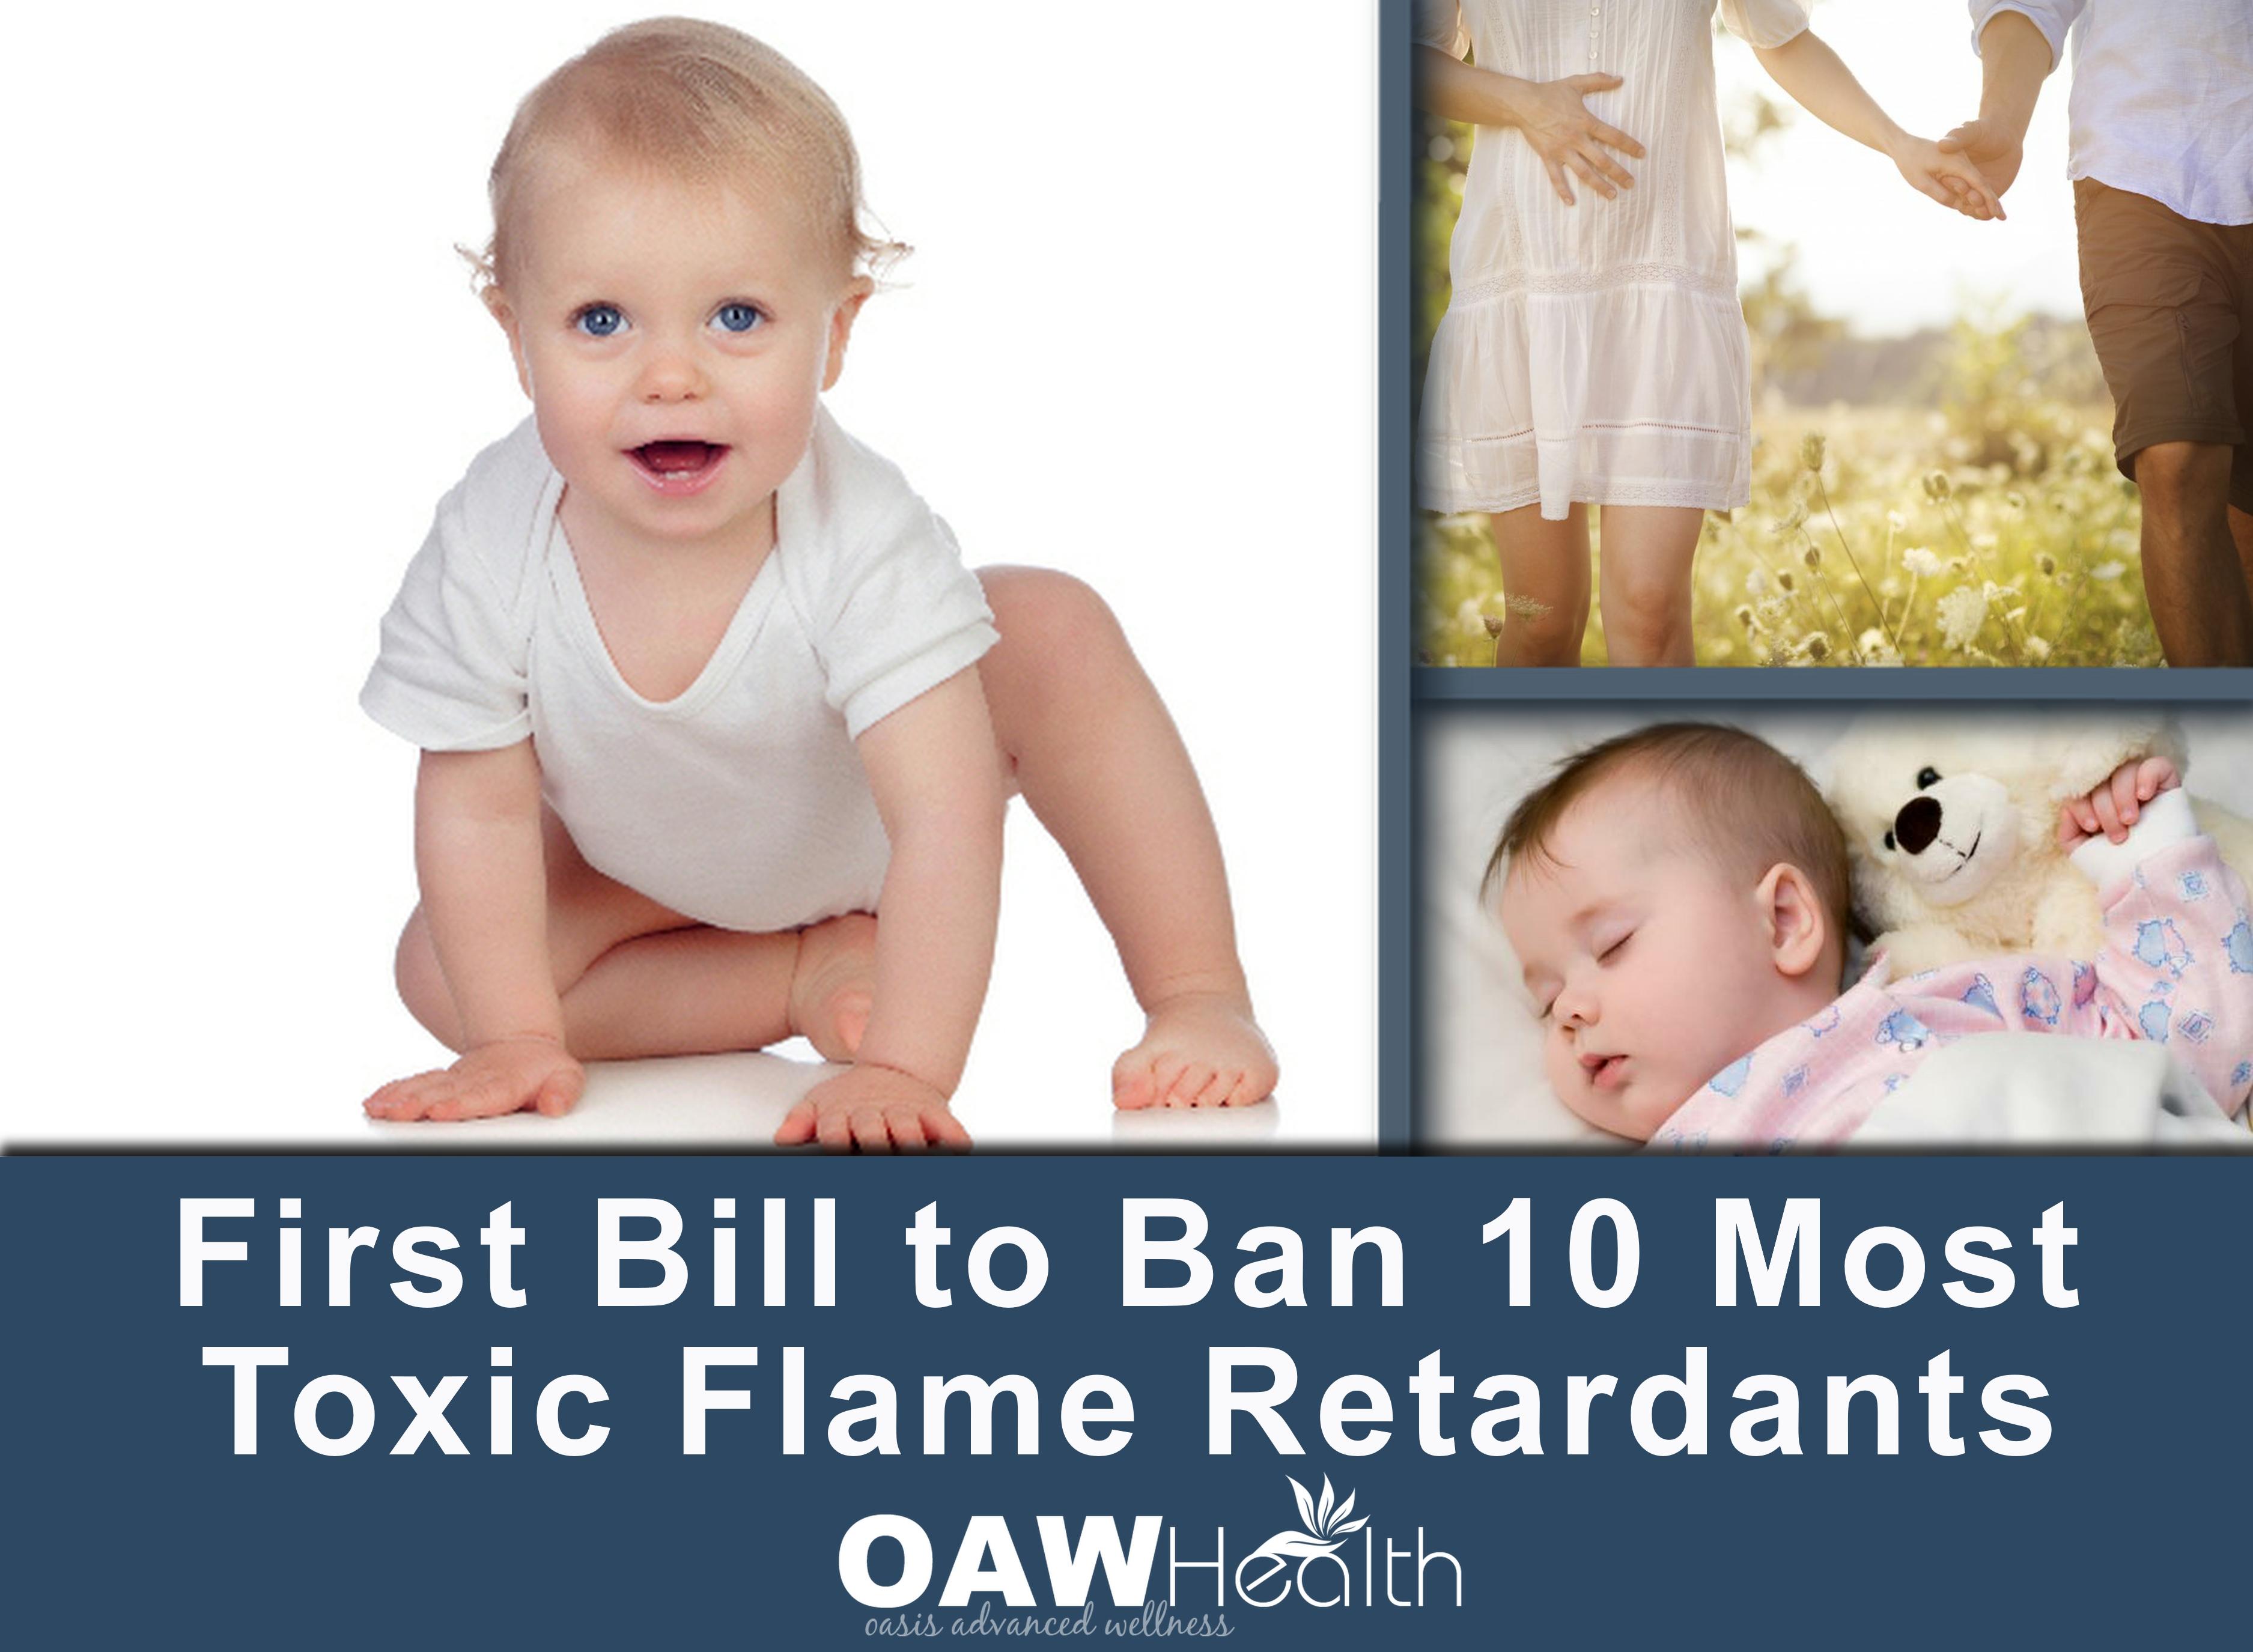 New York Senator Unveils First Bill to Ban 10 Most Toxic Flame Retardants